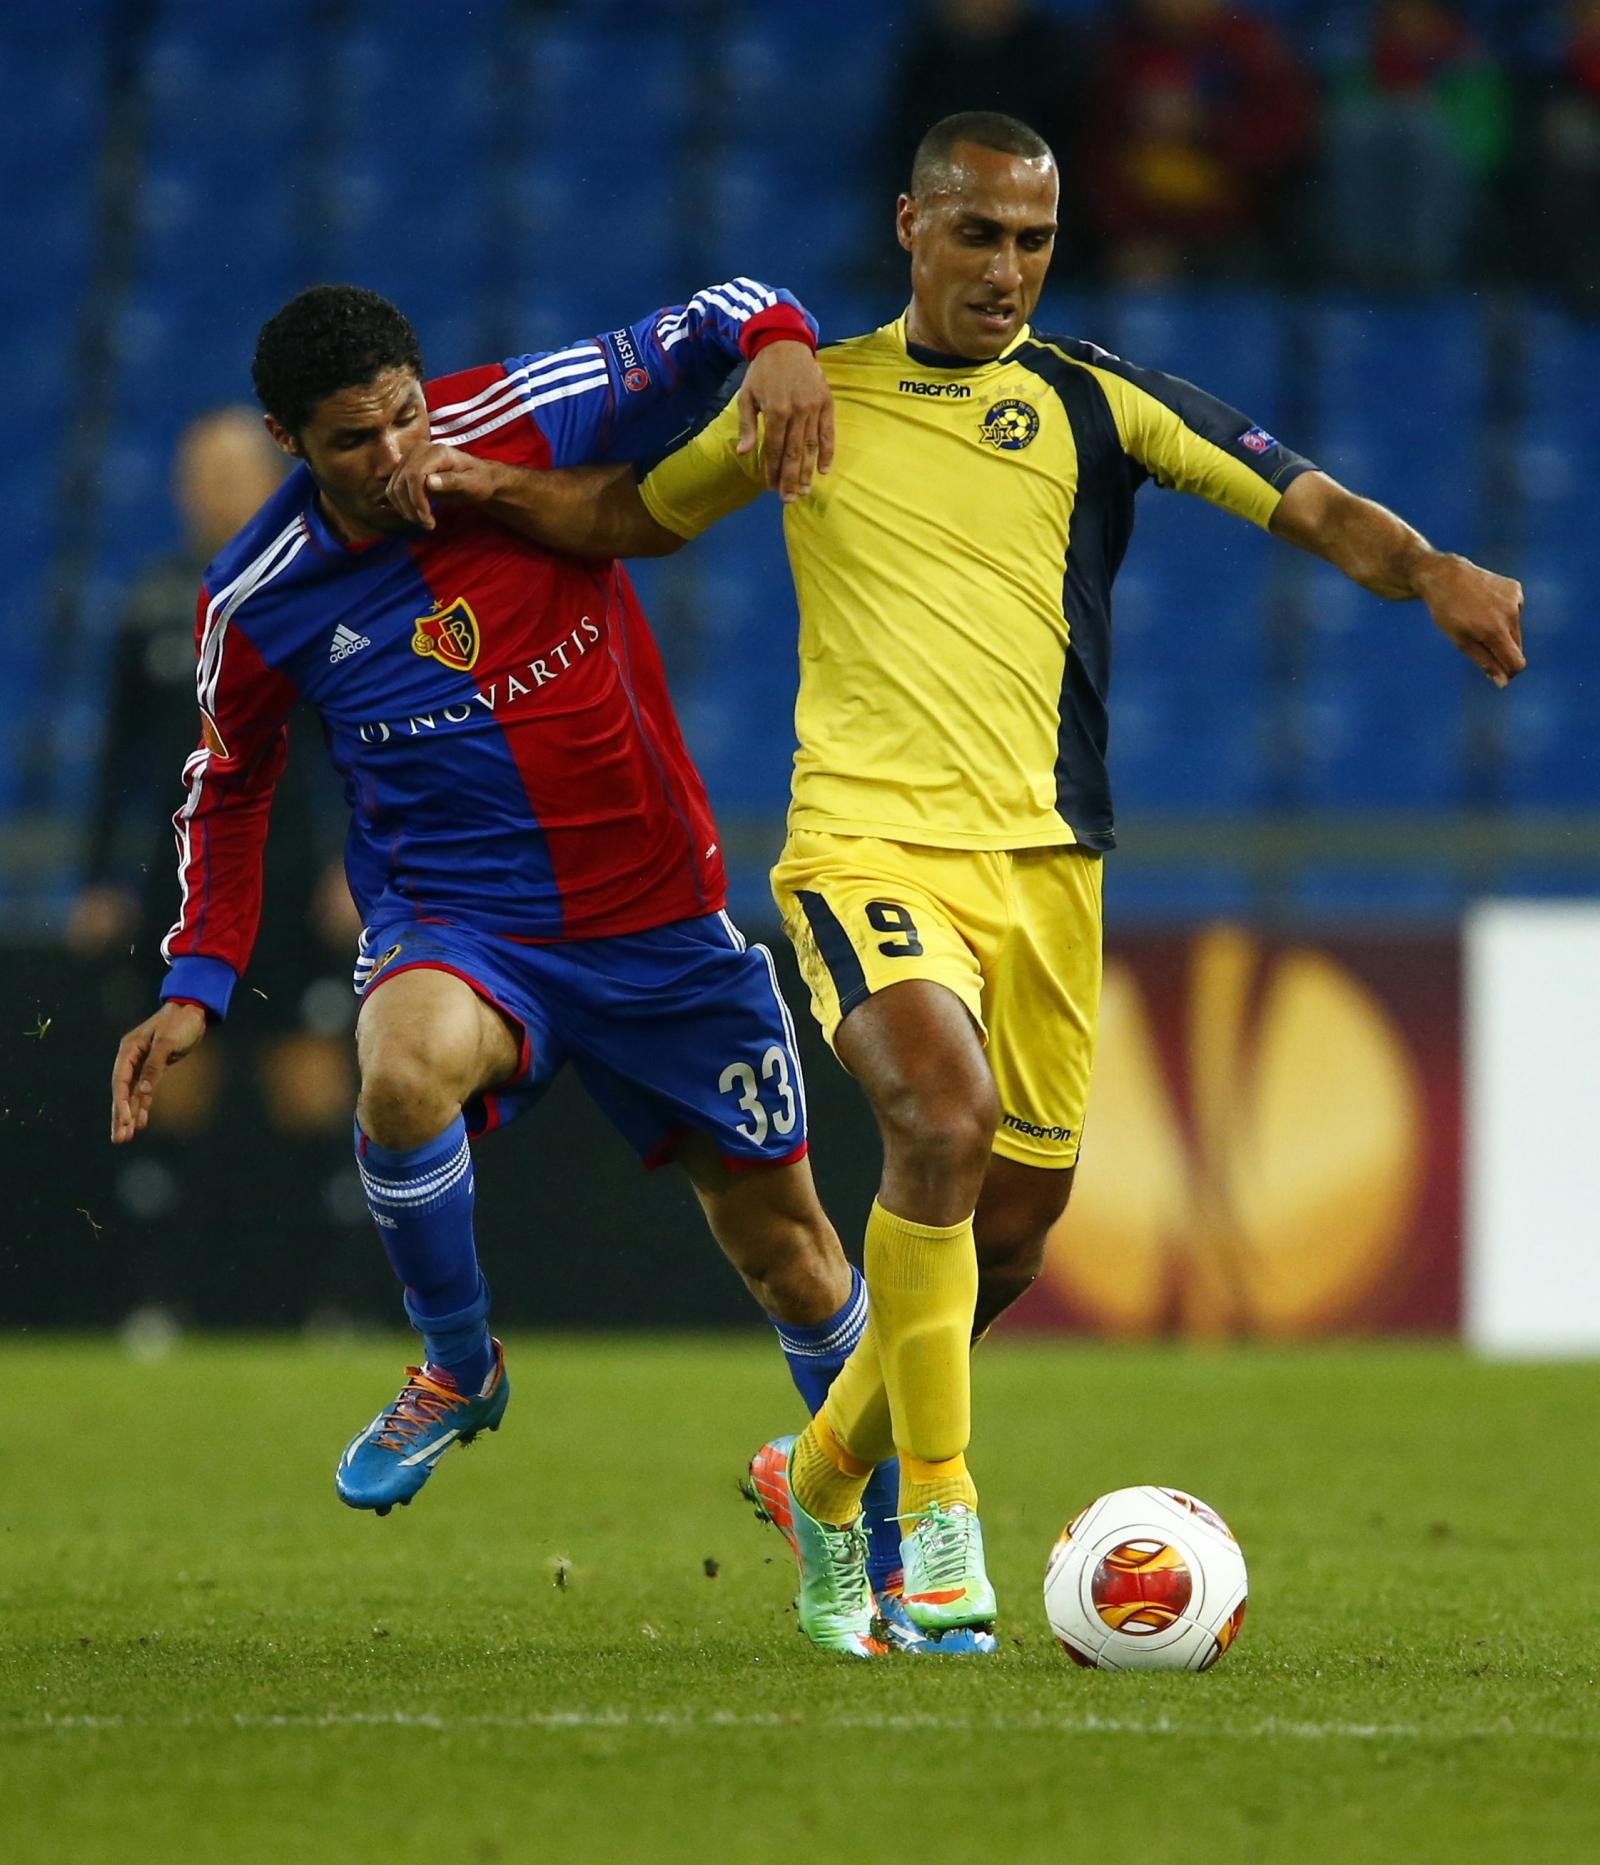 FC Basel's Mohamed Elneny (L) fights for the ball with Maccabi Tel Aviv's Maharan Radi